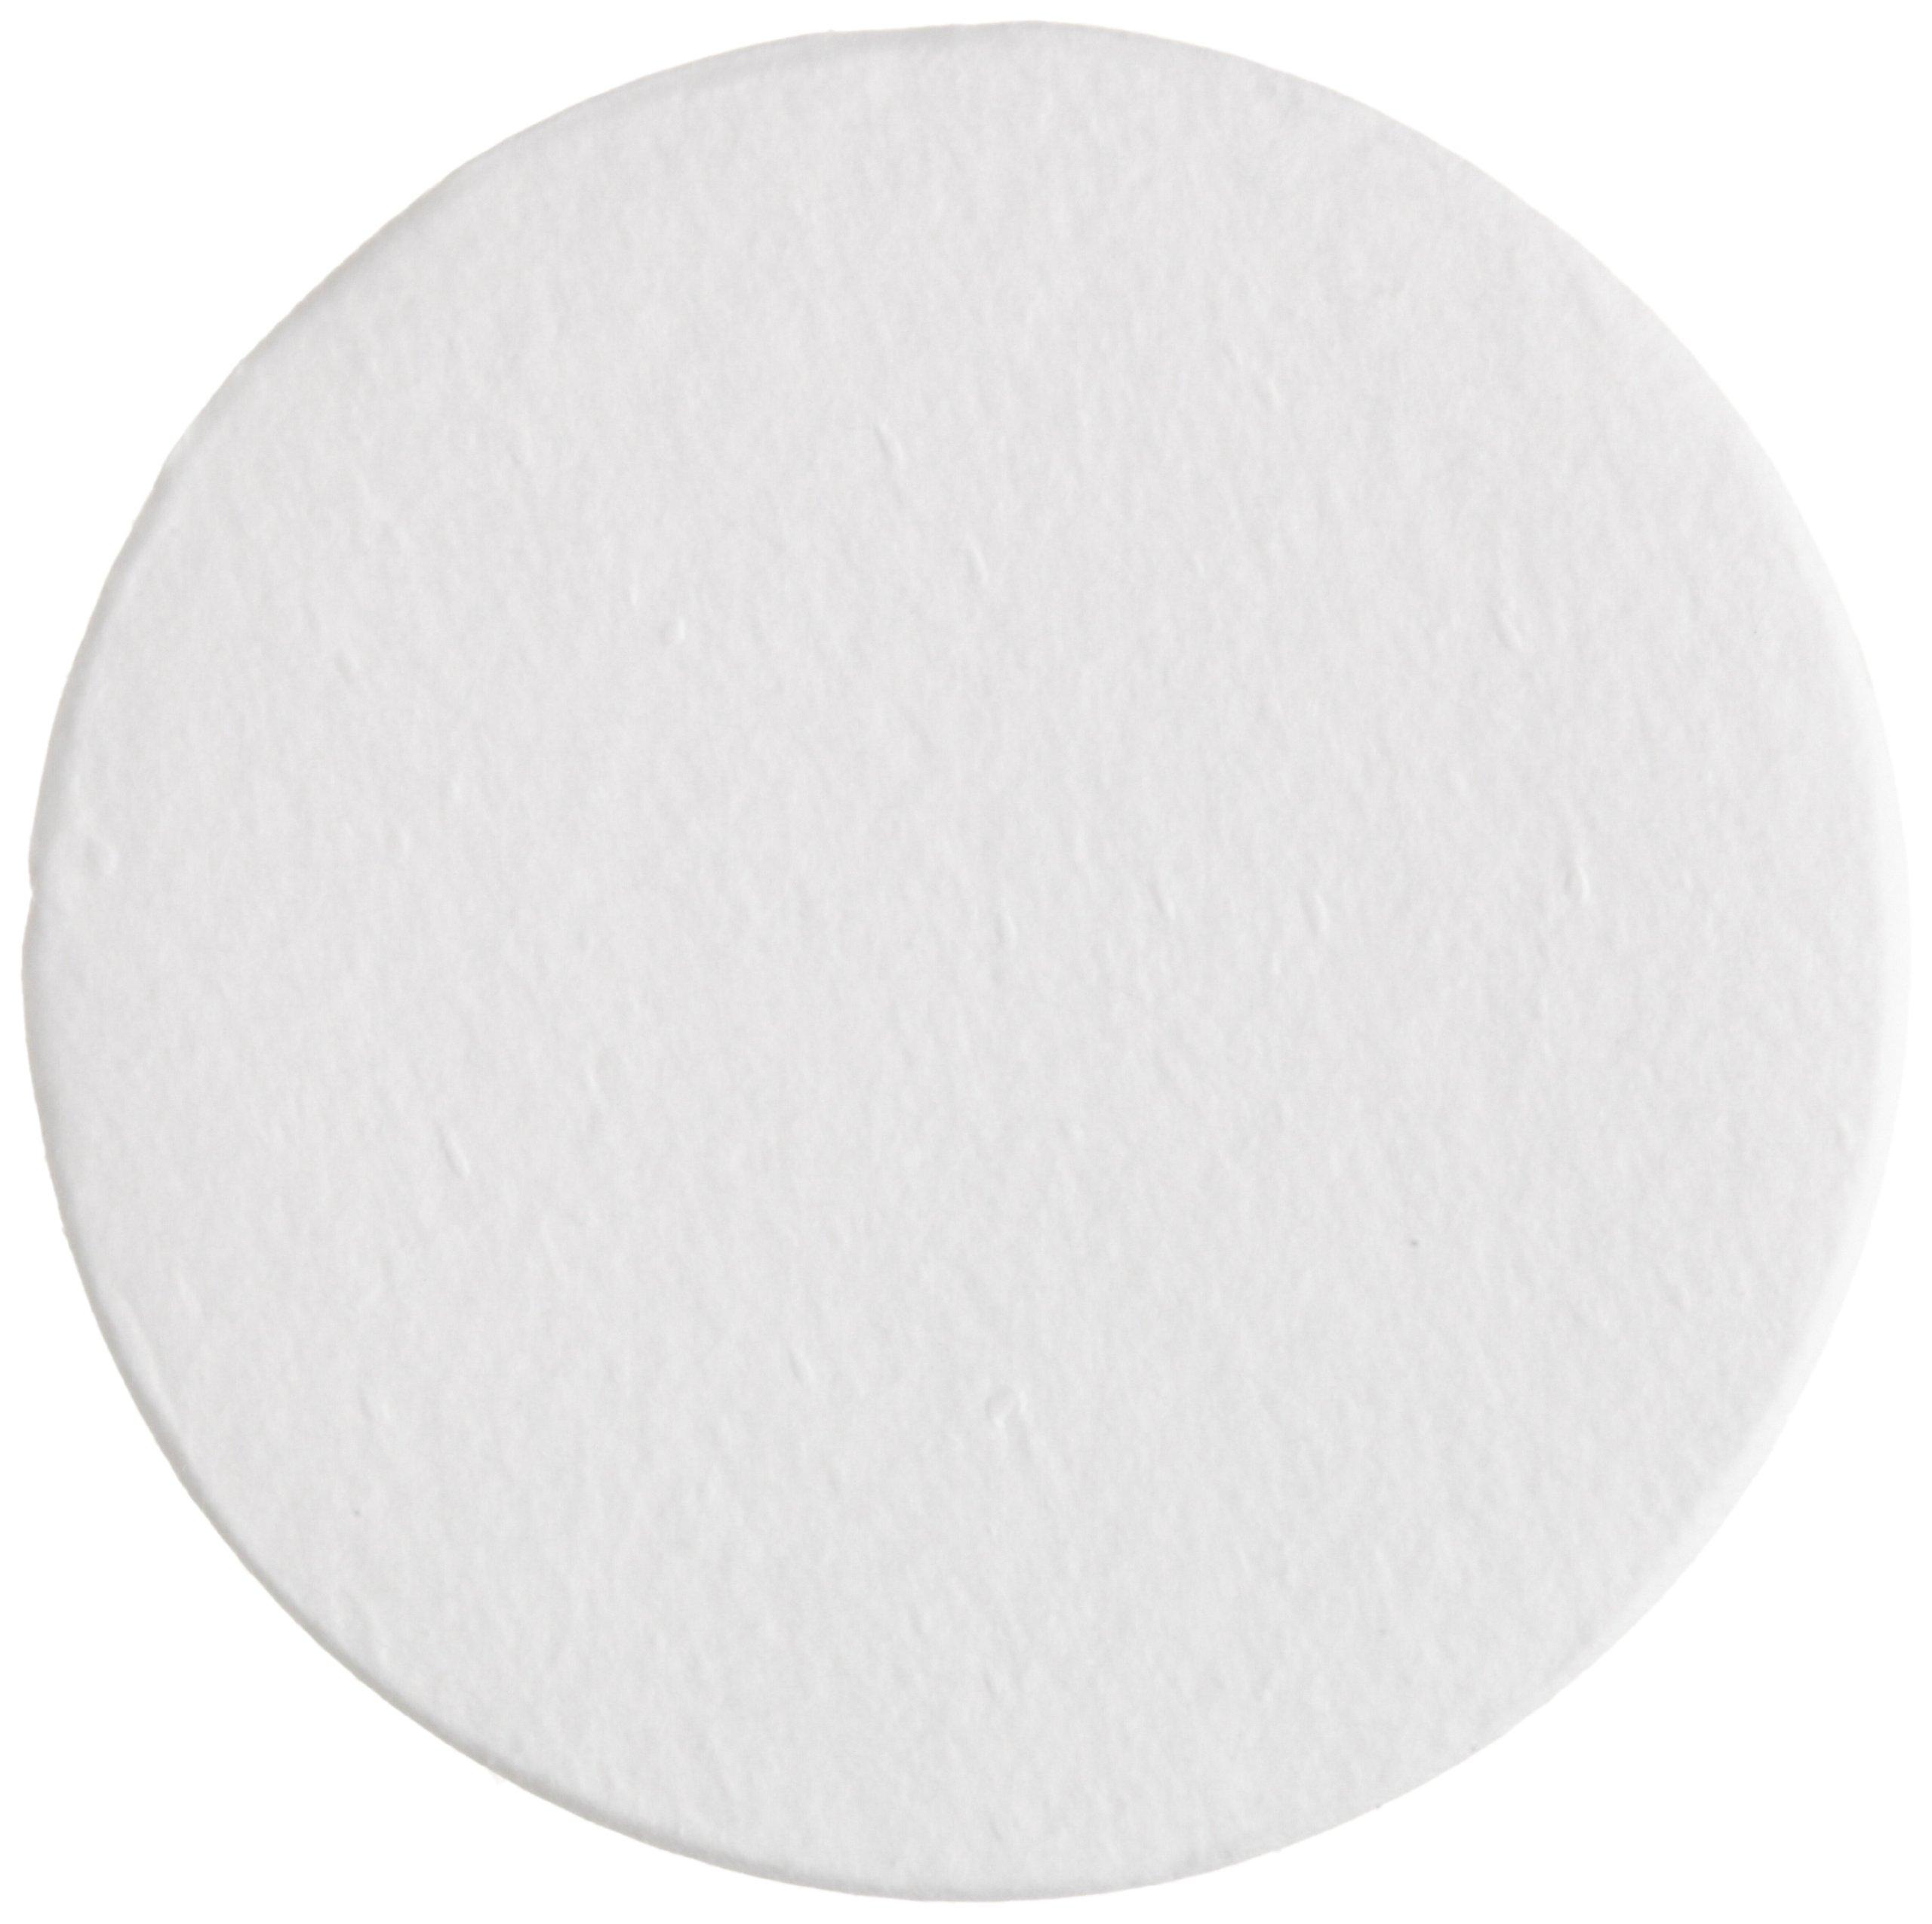 Ahlstrom 1610-0470 Borosilicate Glass Microfiber Filter Paper, 1.1 Micron, Medium Flow, Grade 161, 4.7cm Diameter (Box of 100) by Ahlstrom